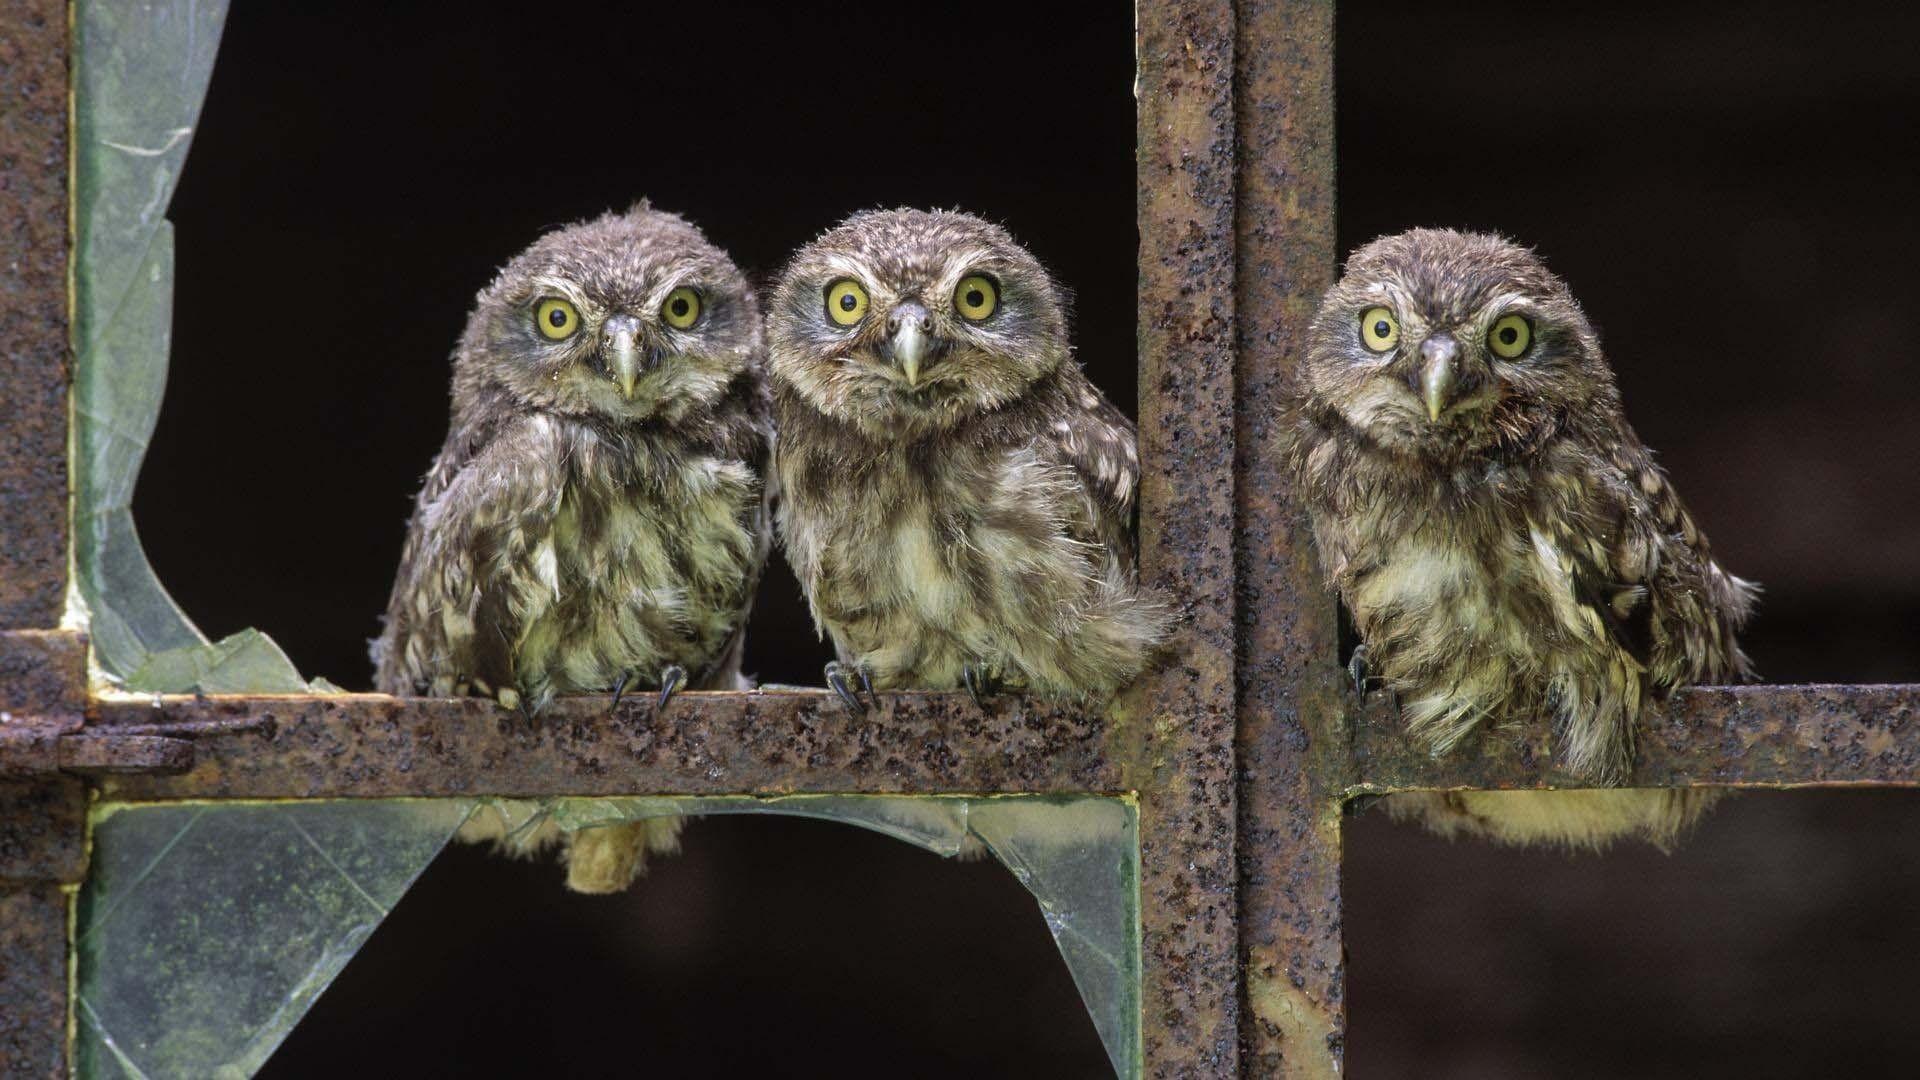 Cute Owls Wallpaper HD Download Of Cute Birds Wallpaper